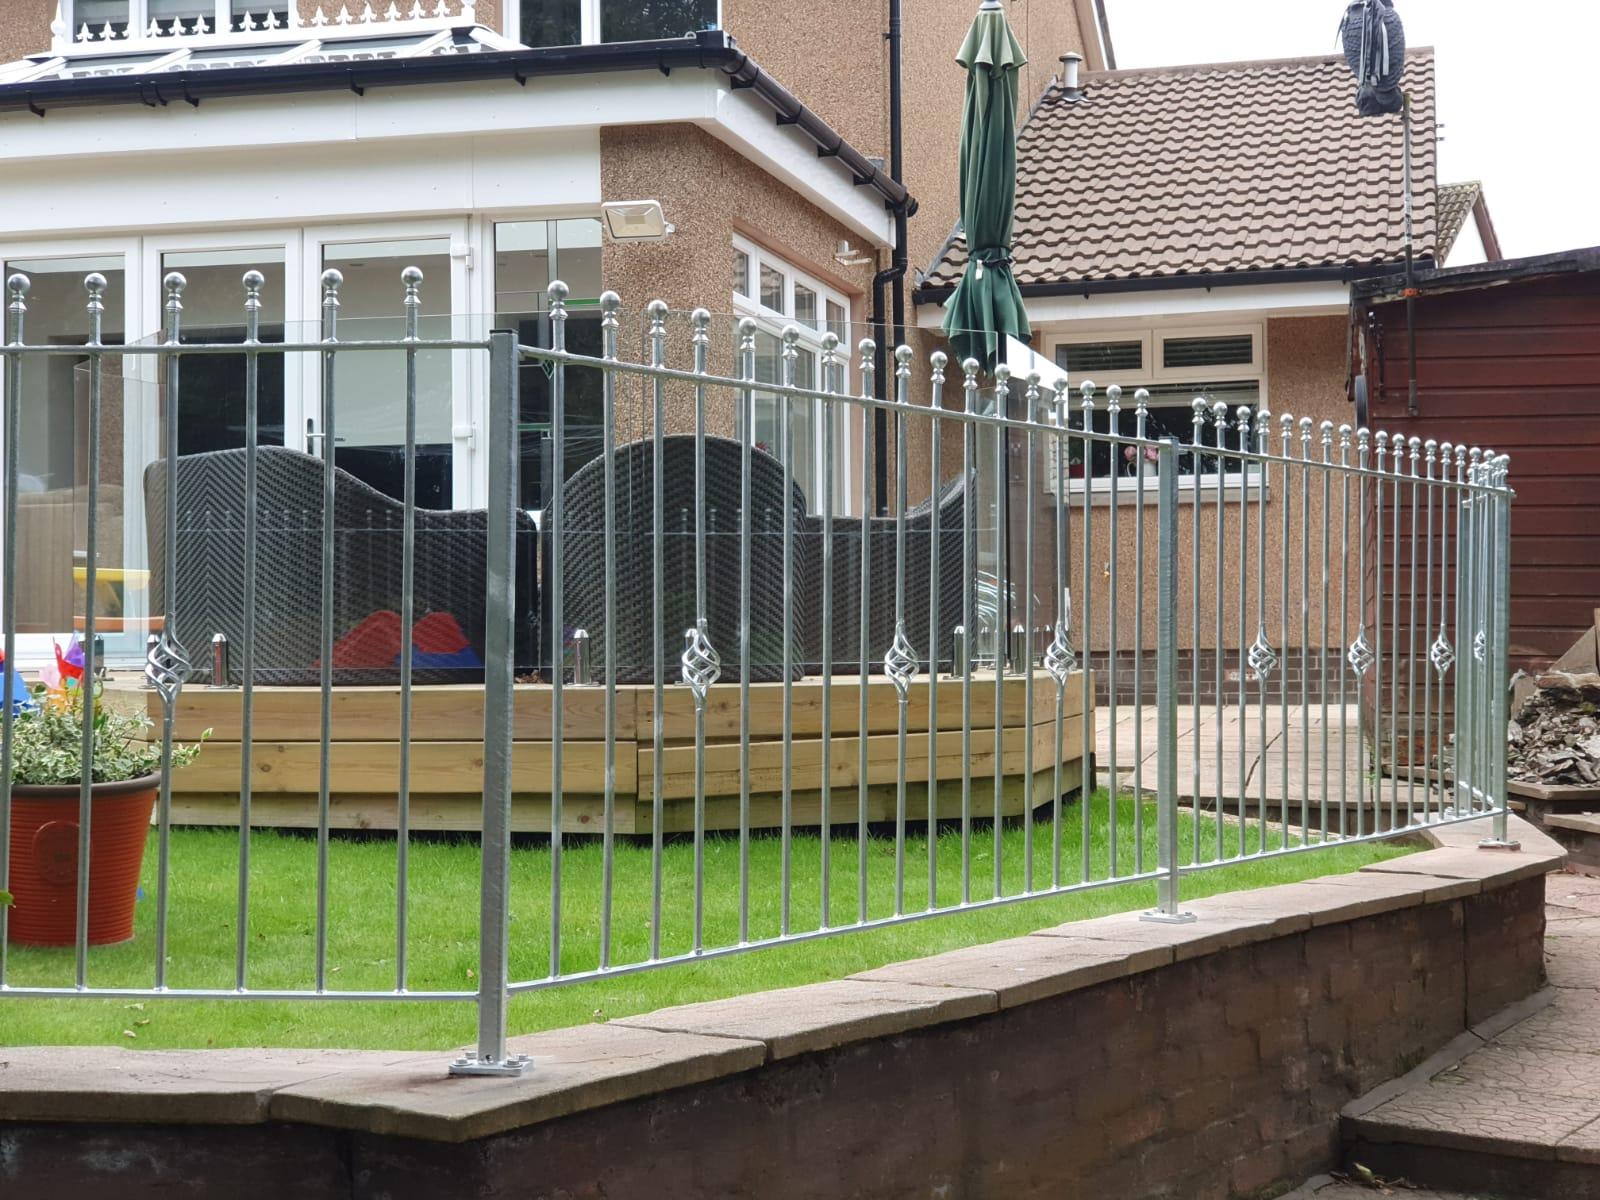 galvanized metal fencing railings by Dain Art Iron, Ayrshire Scotland.